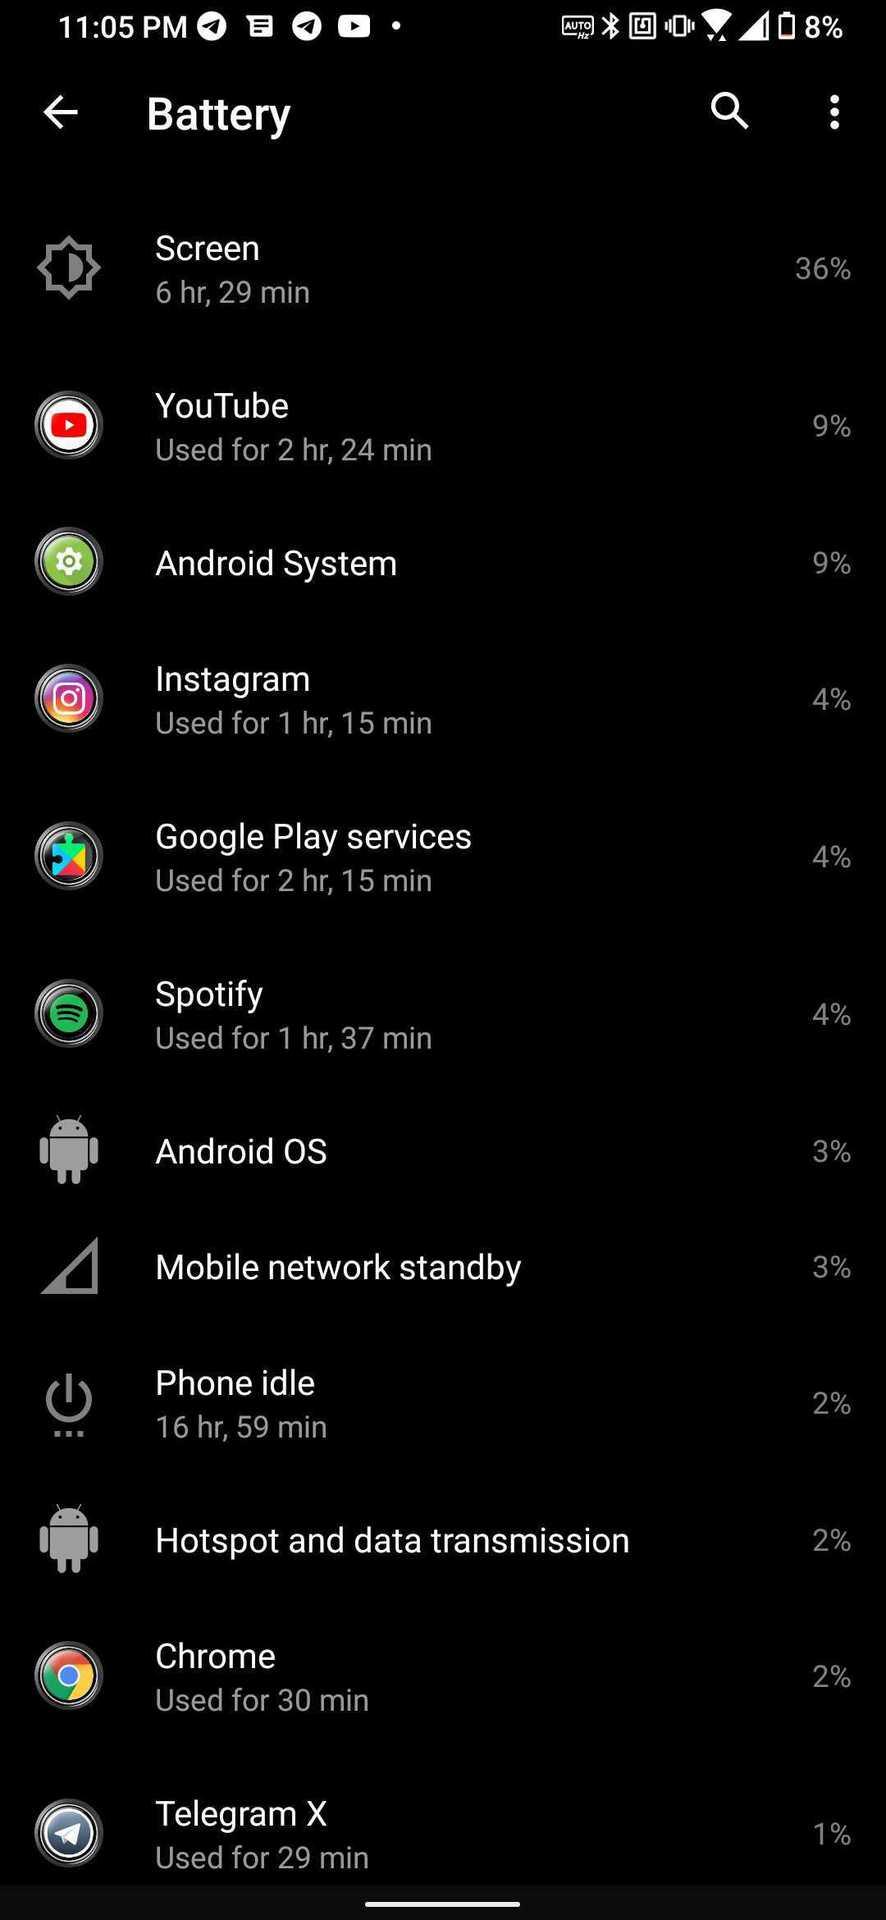 Asus ROG Phone 3 battery life 3